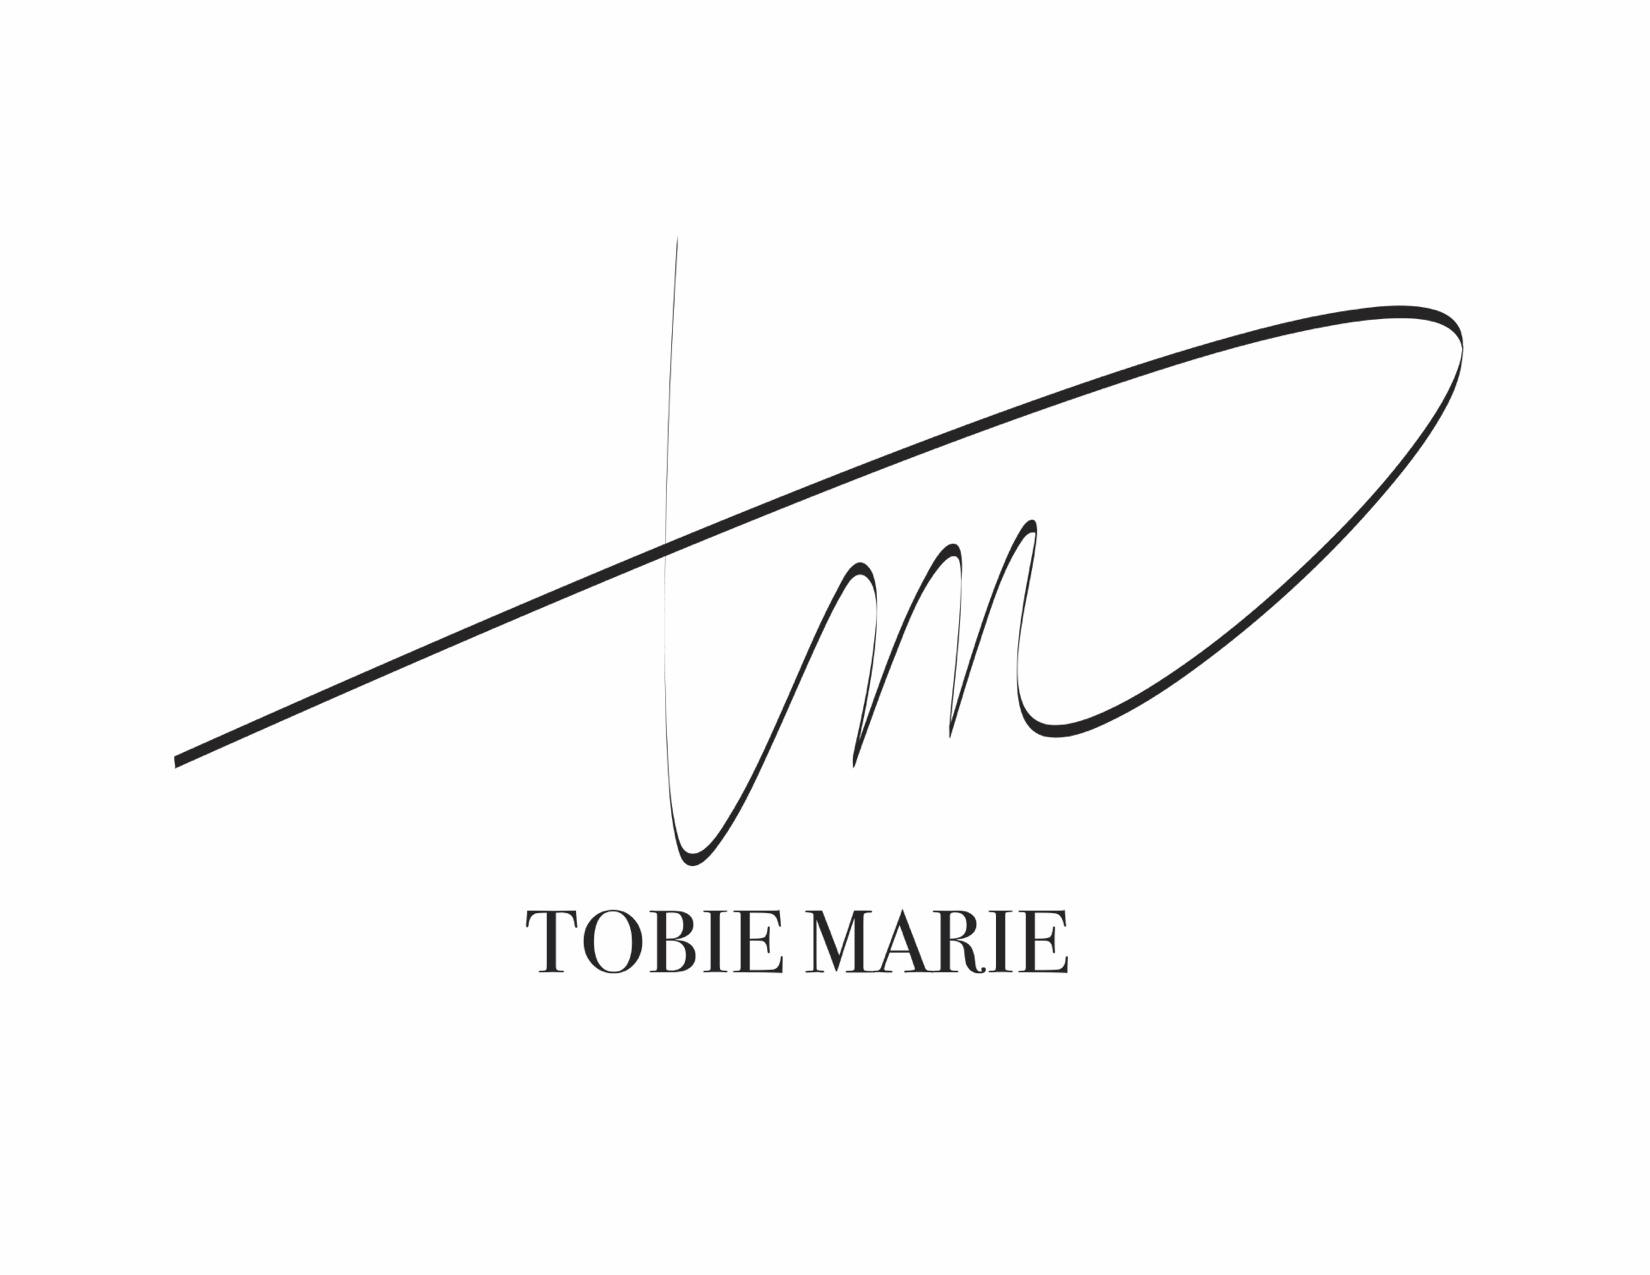 Tobie Marie